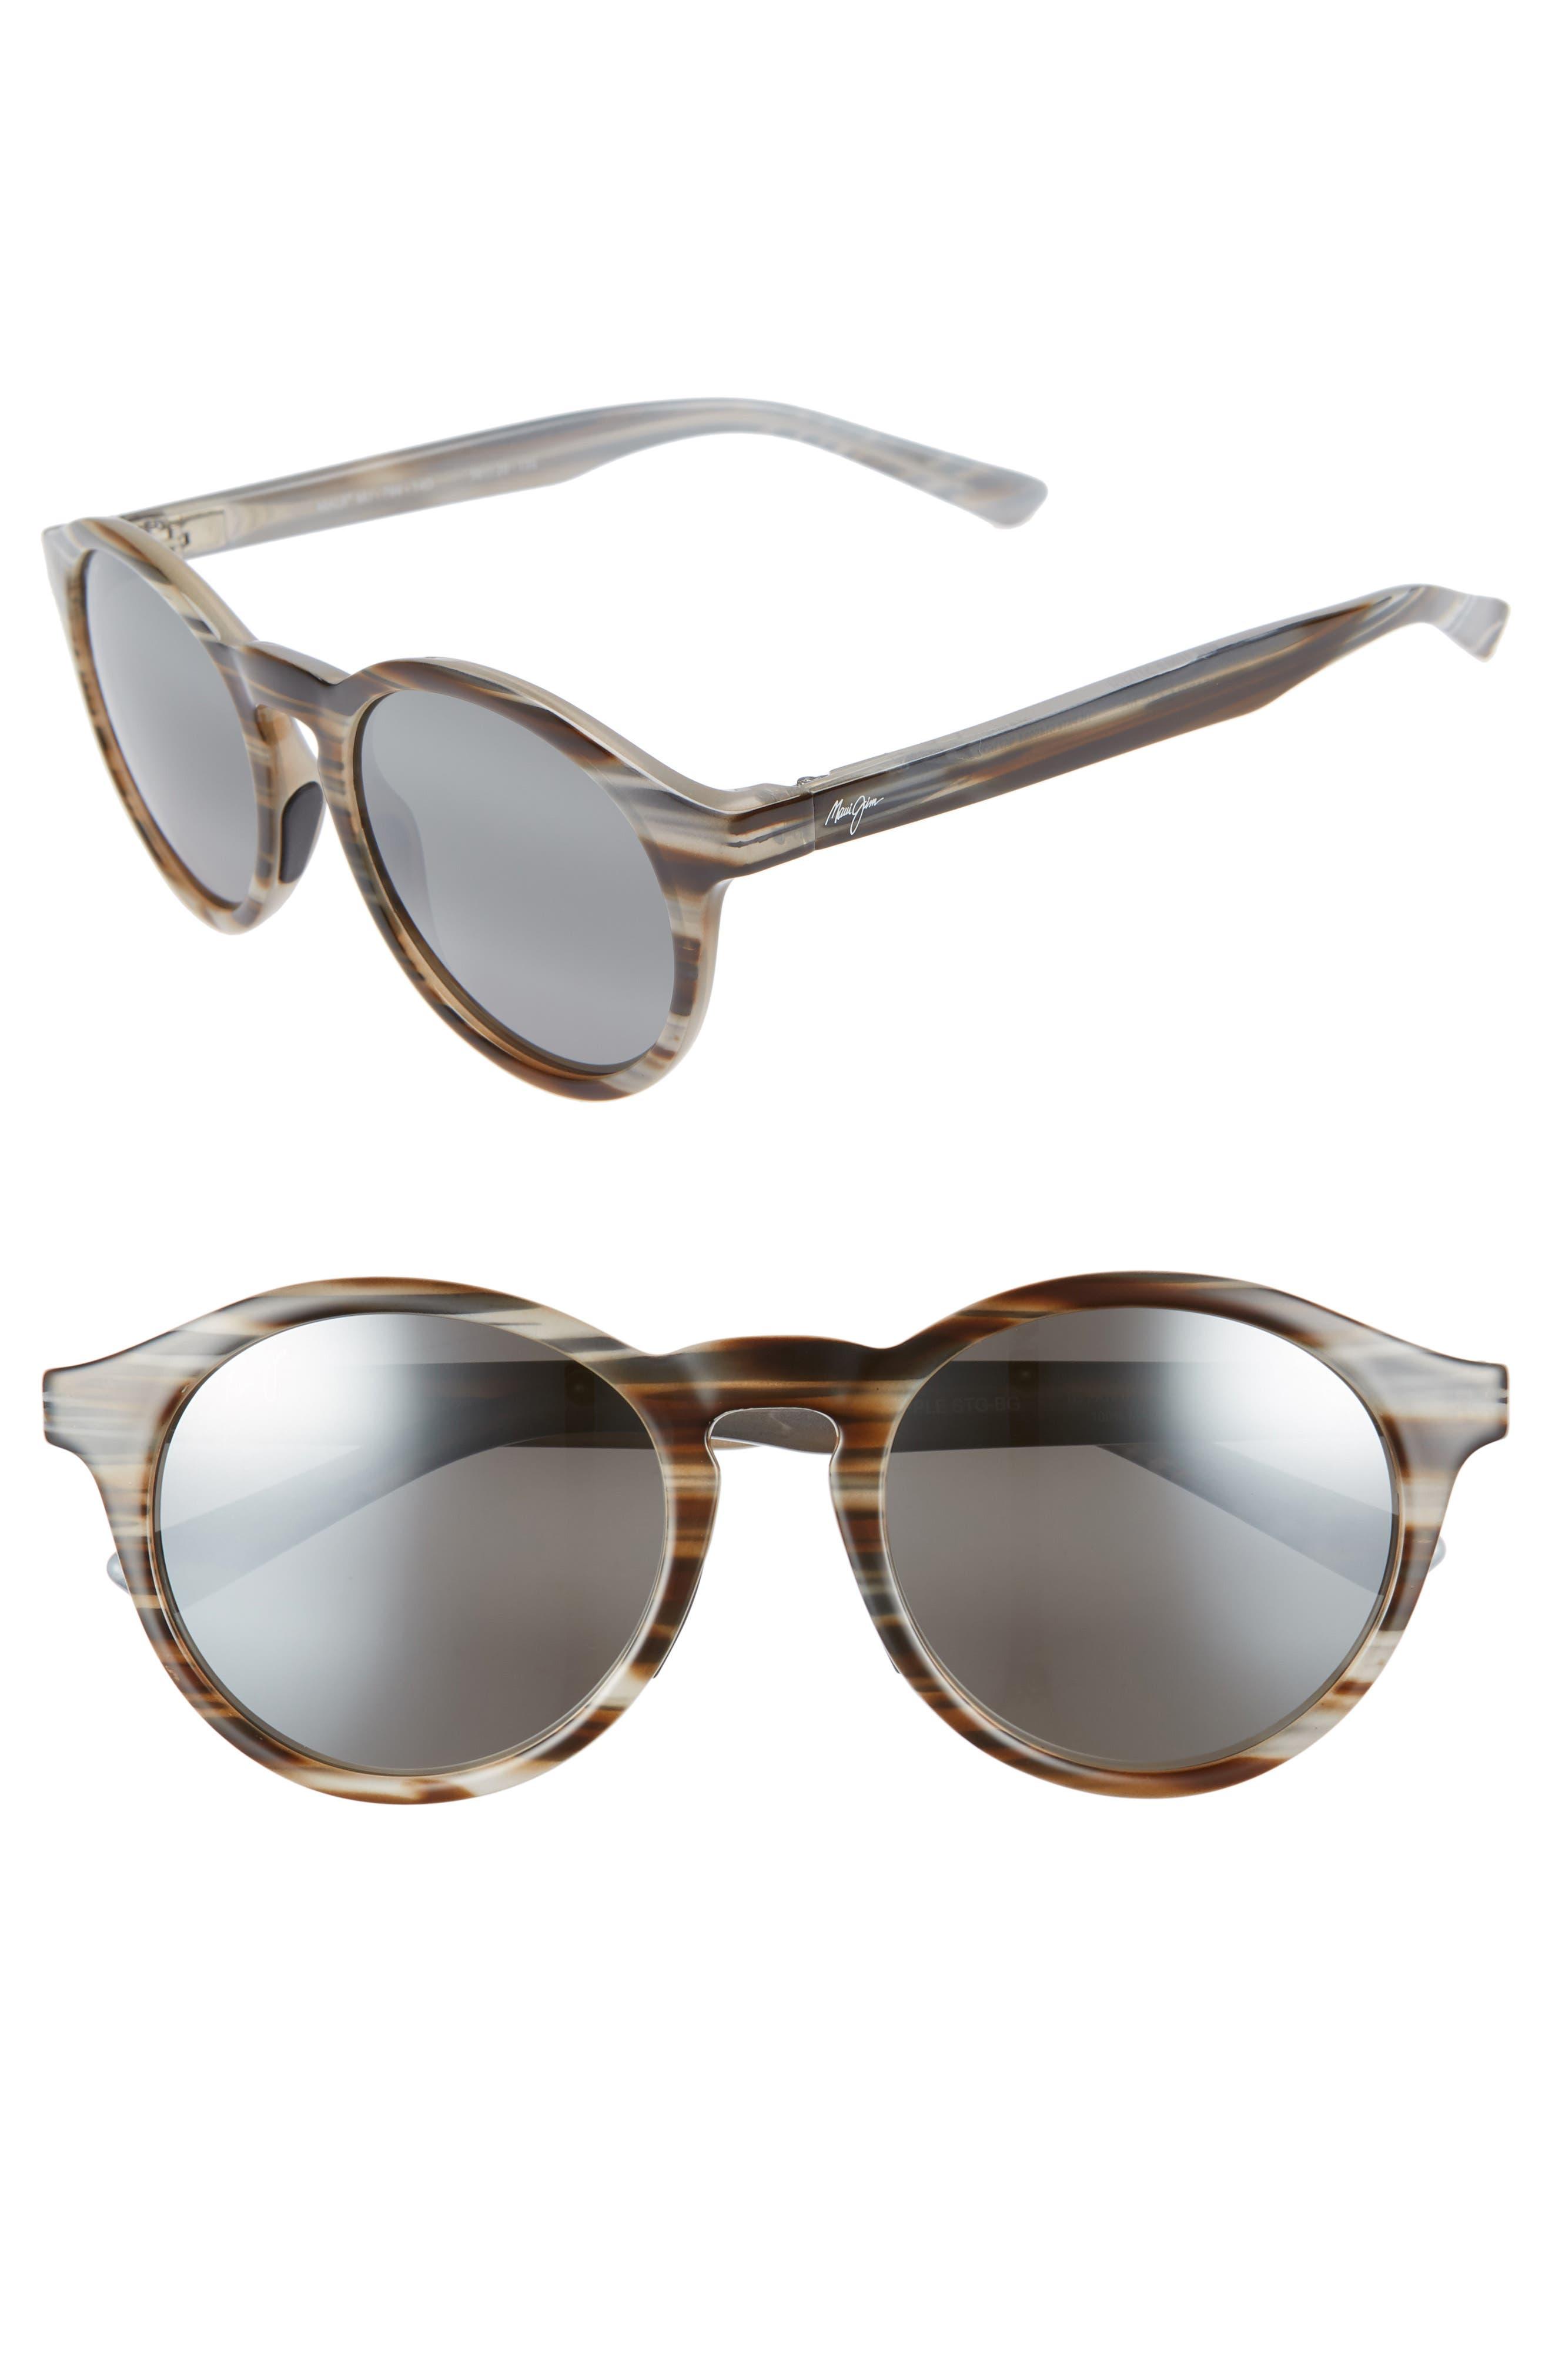 Maui Jim Pineapple 50Mm Polarized Round Sunglasses - Slate Grey/ Brown Stripe